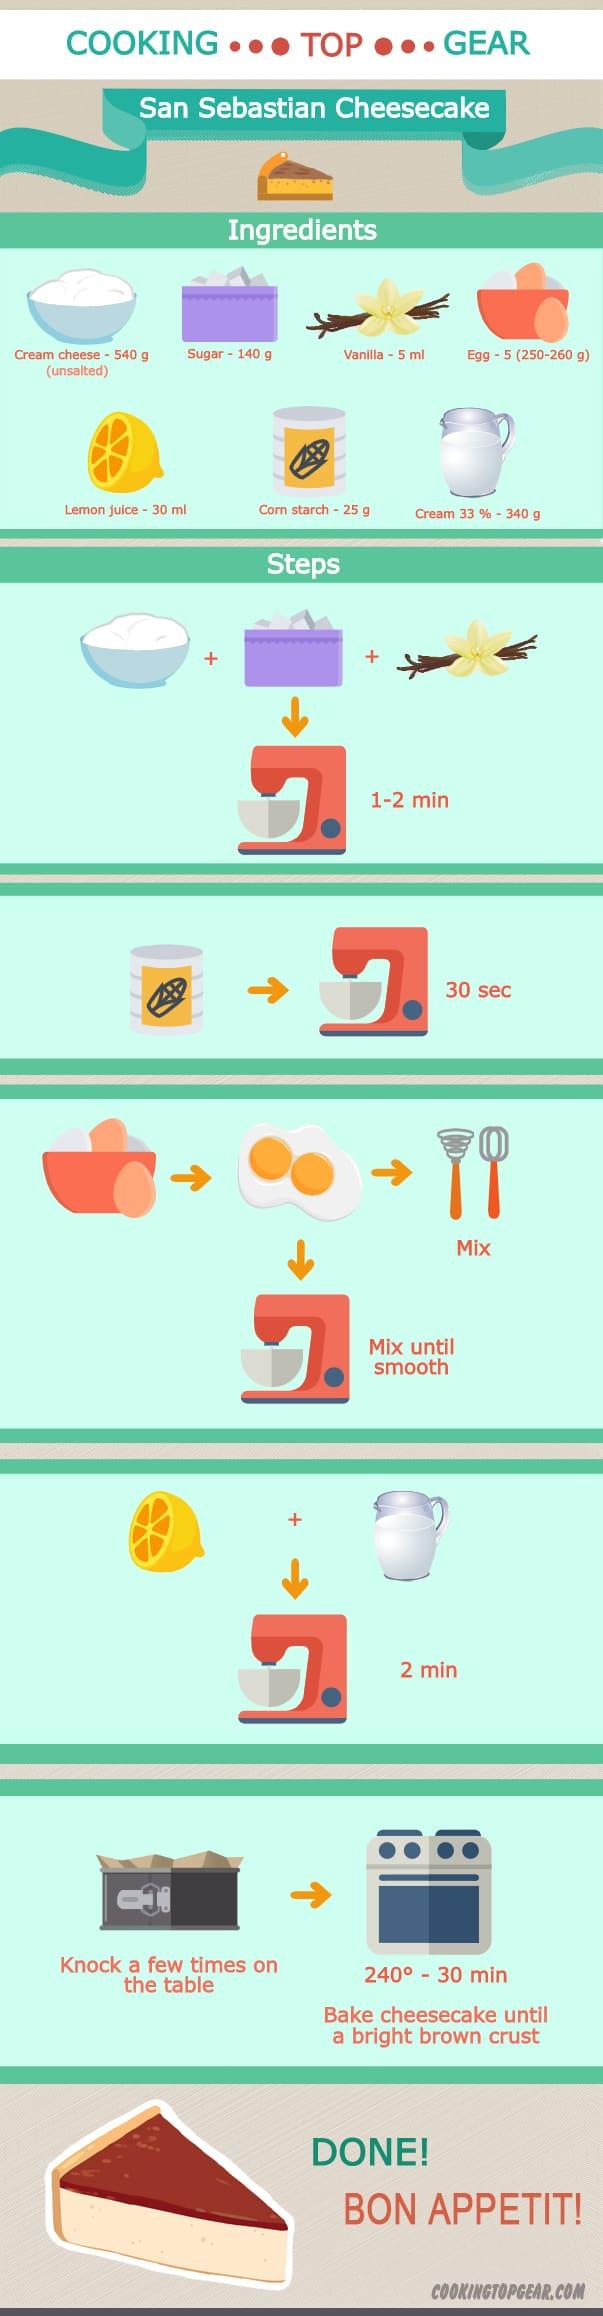 How to make San Sebastiean Cheesecake